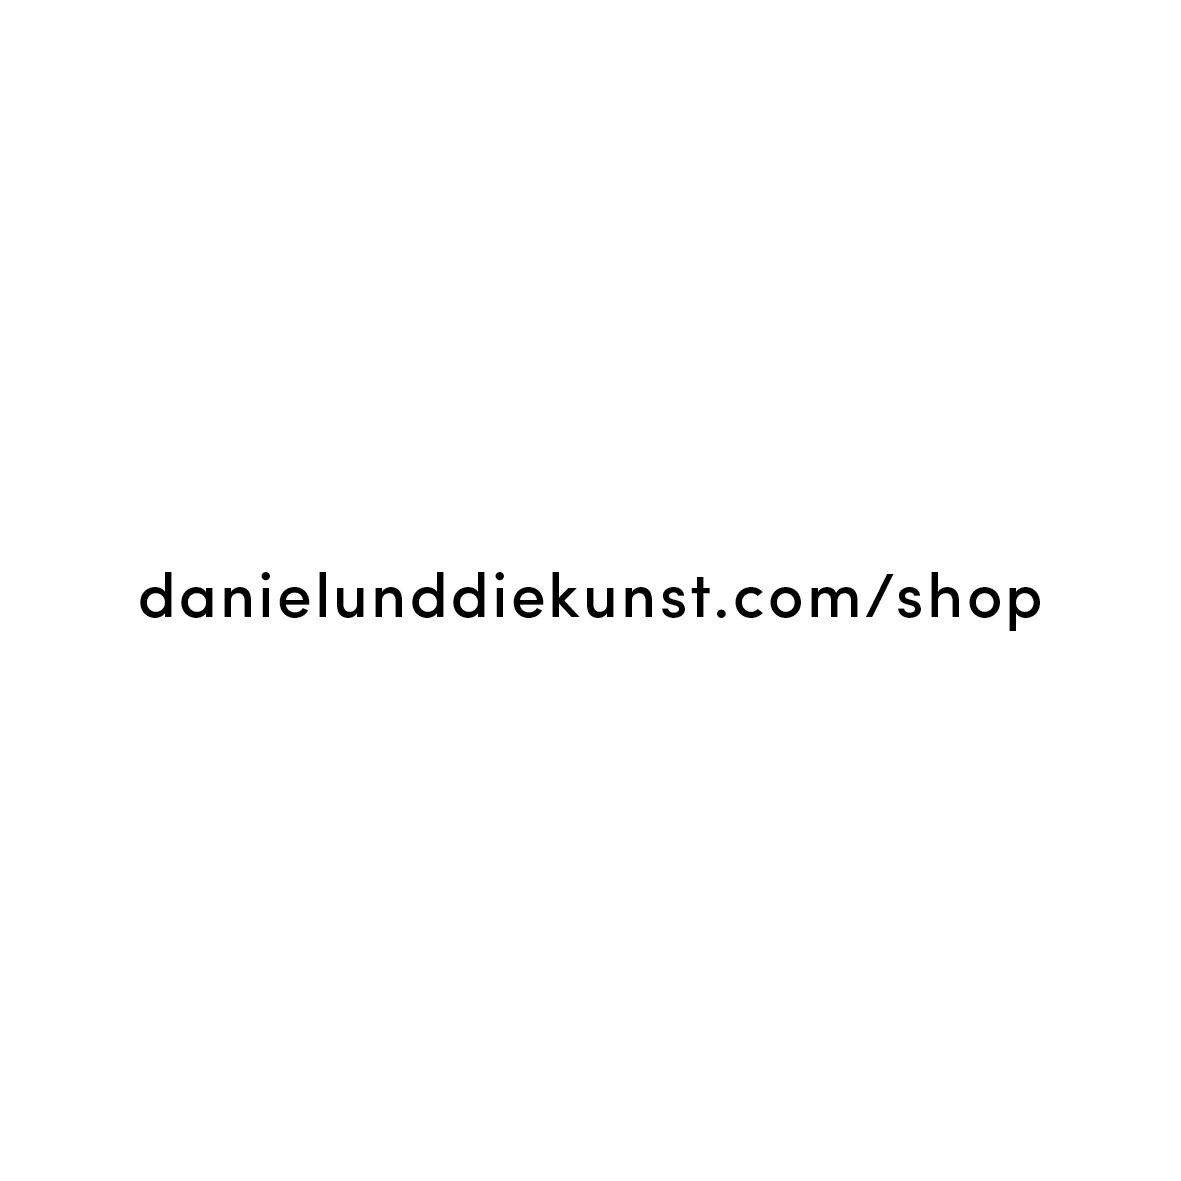 Insta_Shopadresse